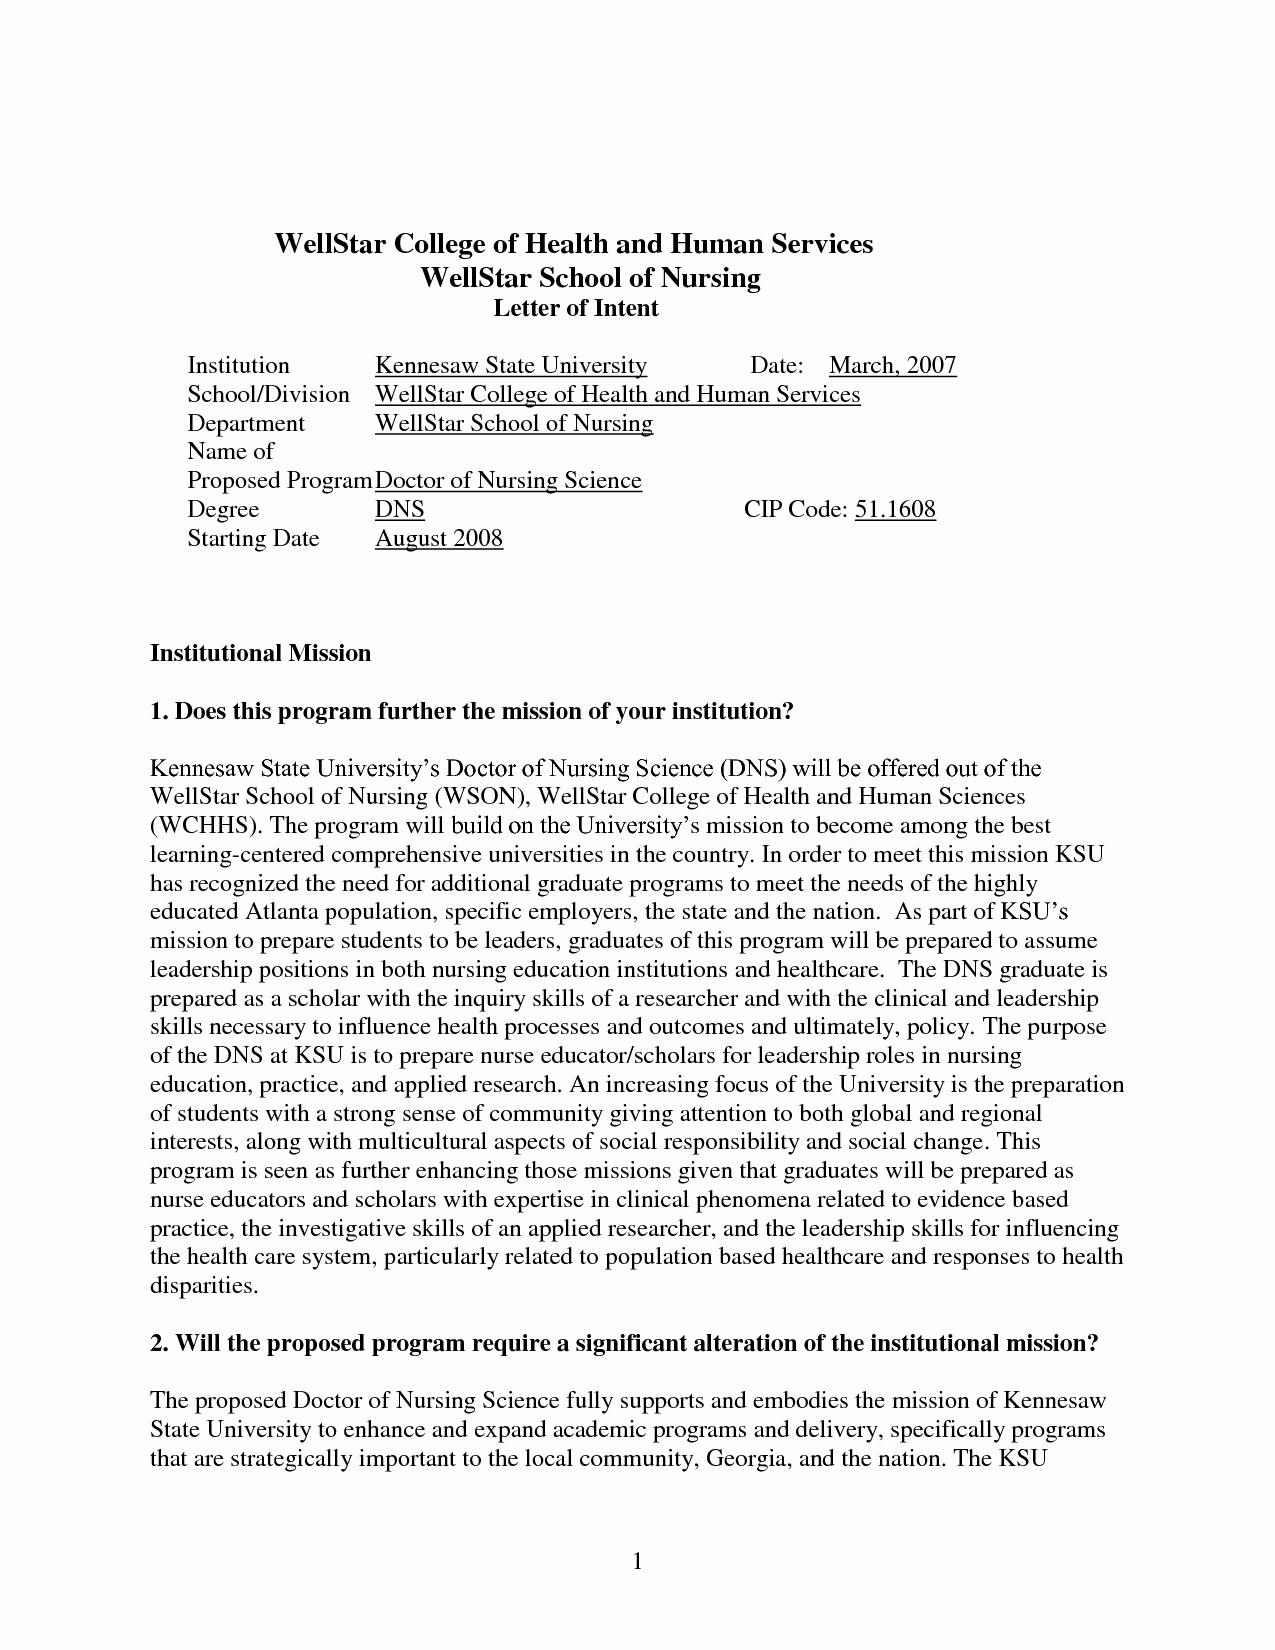 letter of intent grad school